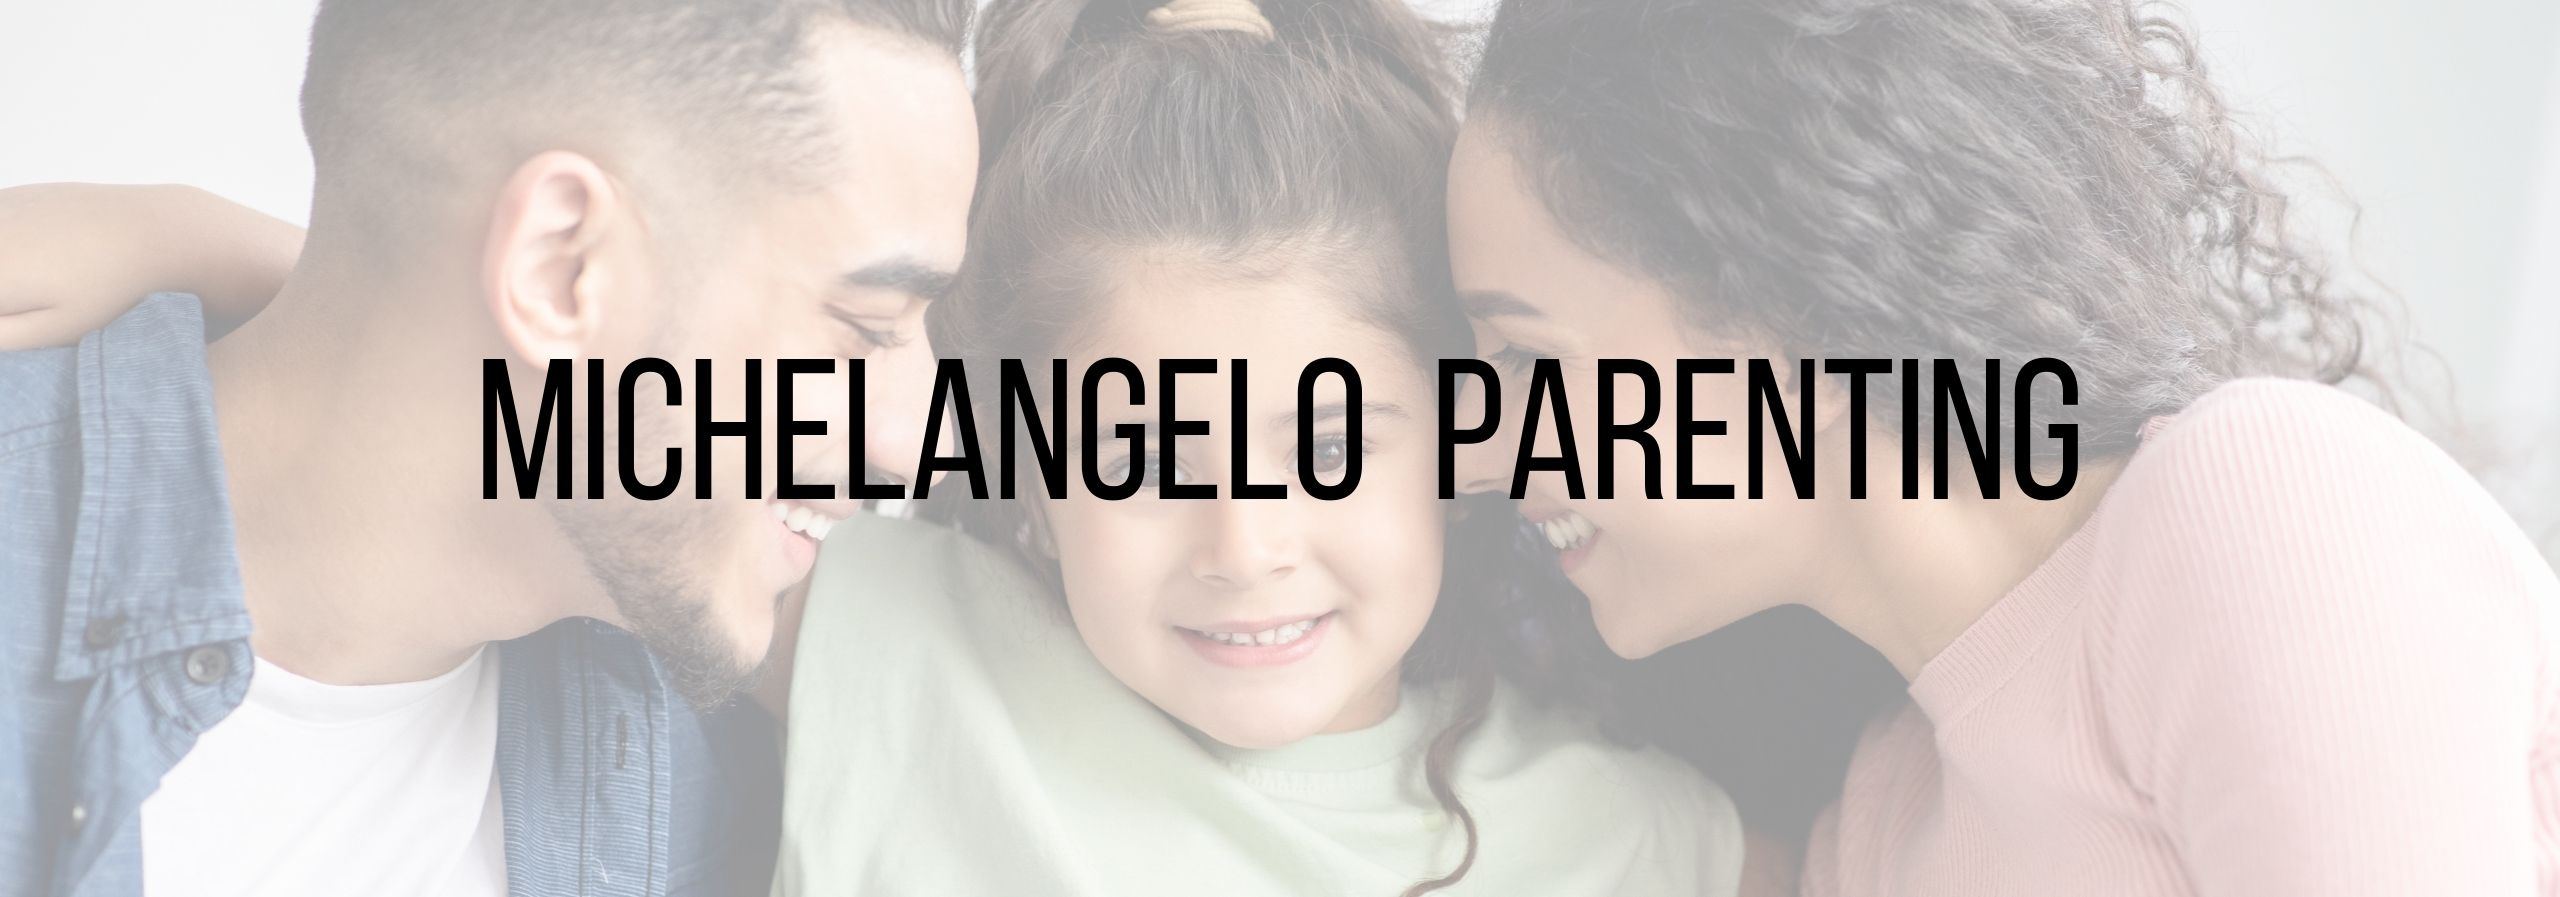 Michelangelo Parenting